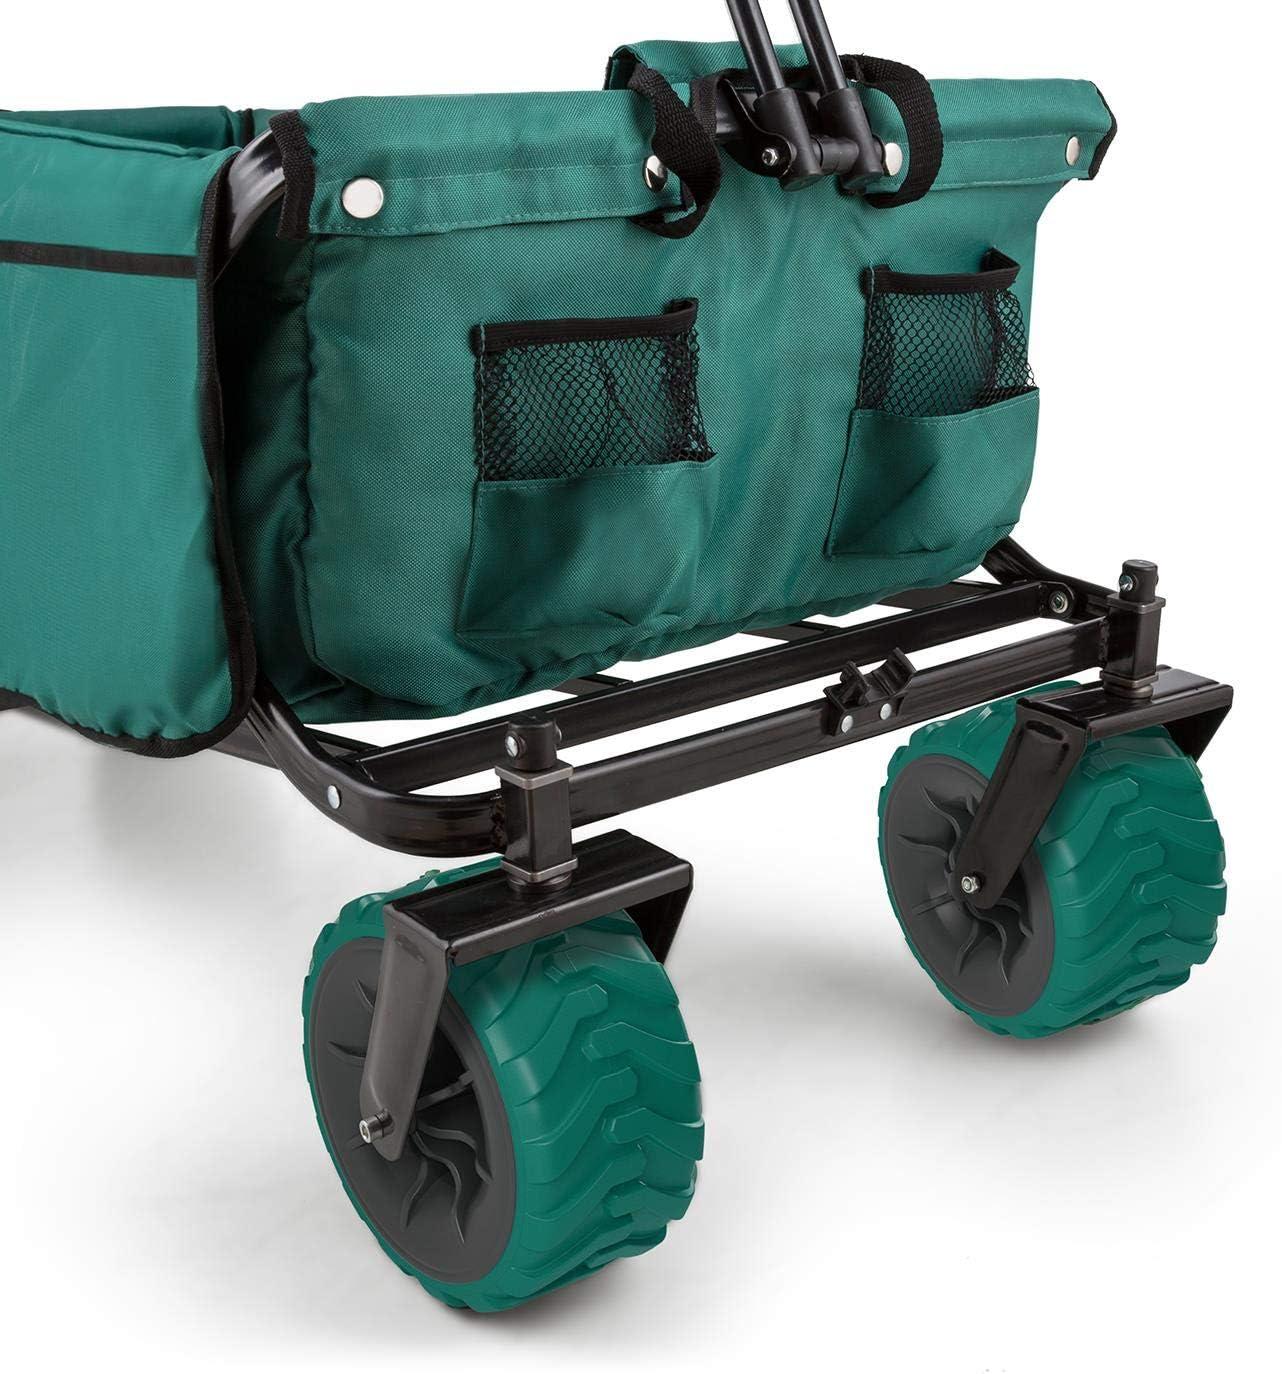 Waldbeck The Green Carro Transporte Plegable jard/ín Verde Carga m/áxima 70kg, 90L Volumen, Bolsillos Laterales, Ruedas Anchas, Suelo Reforzado Acolchado